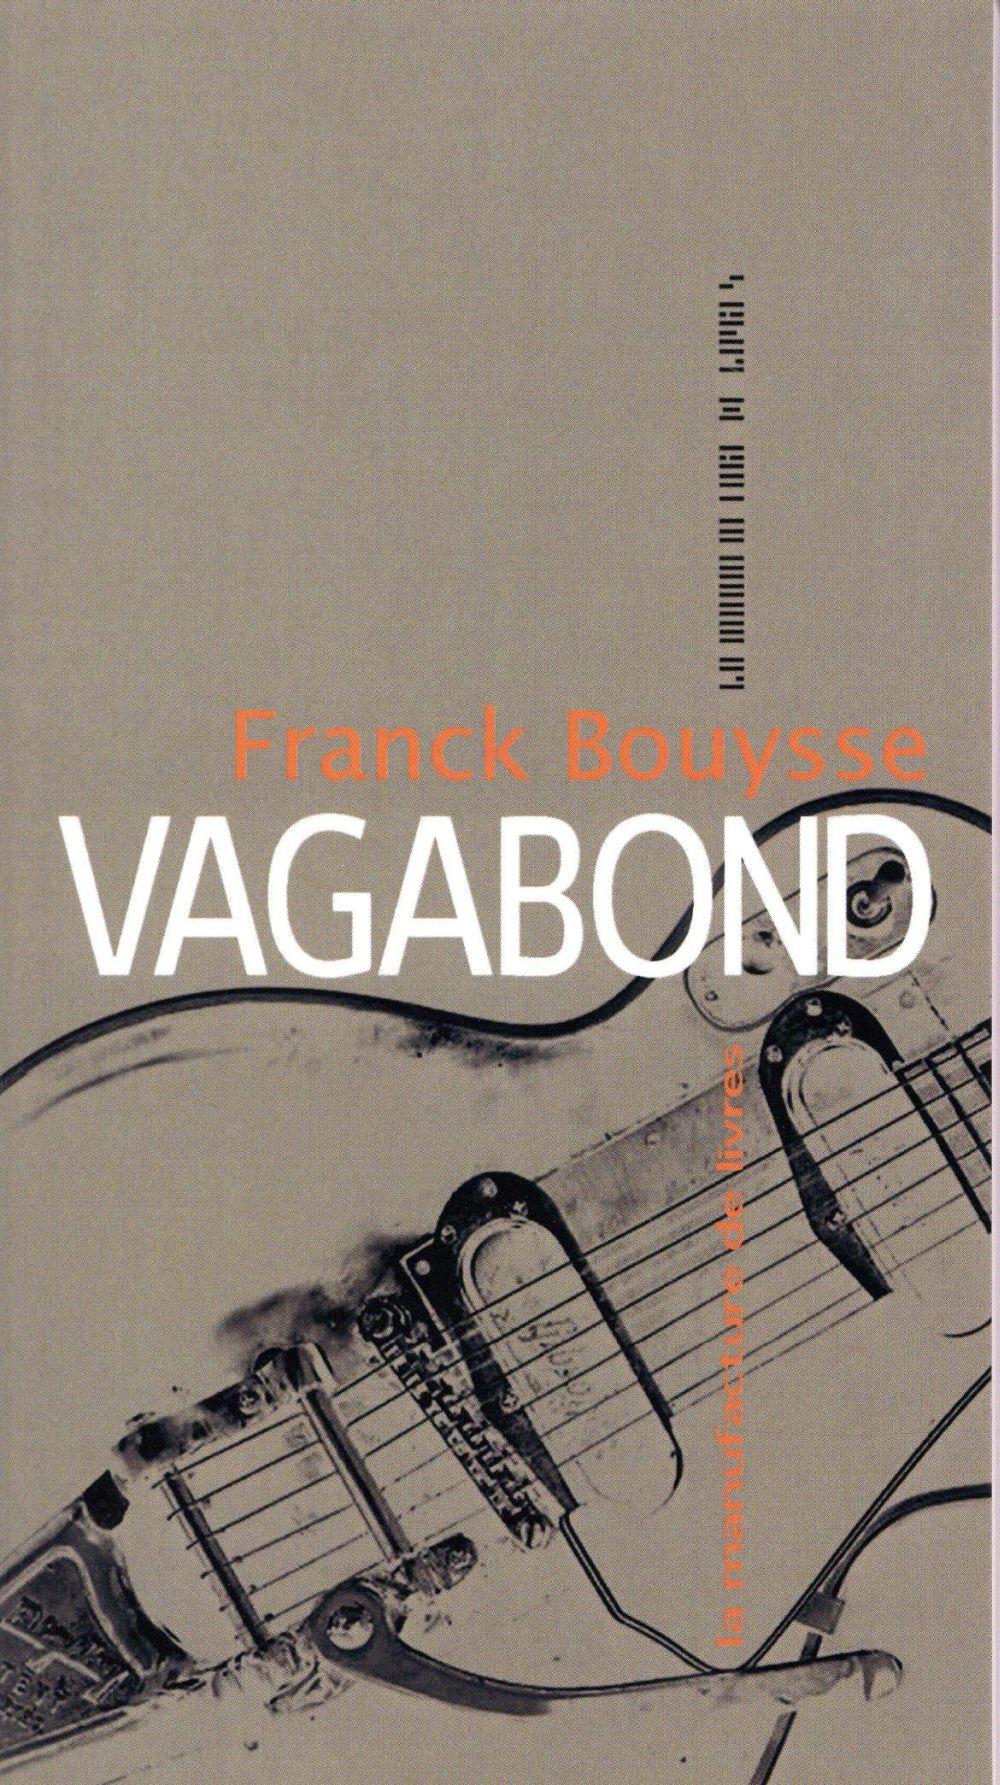 VAGABOND Bouysse Franck